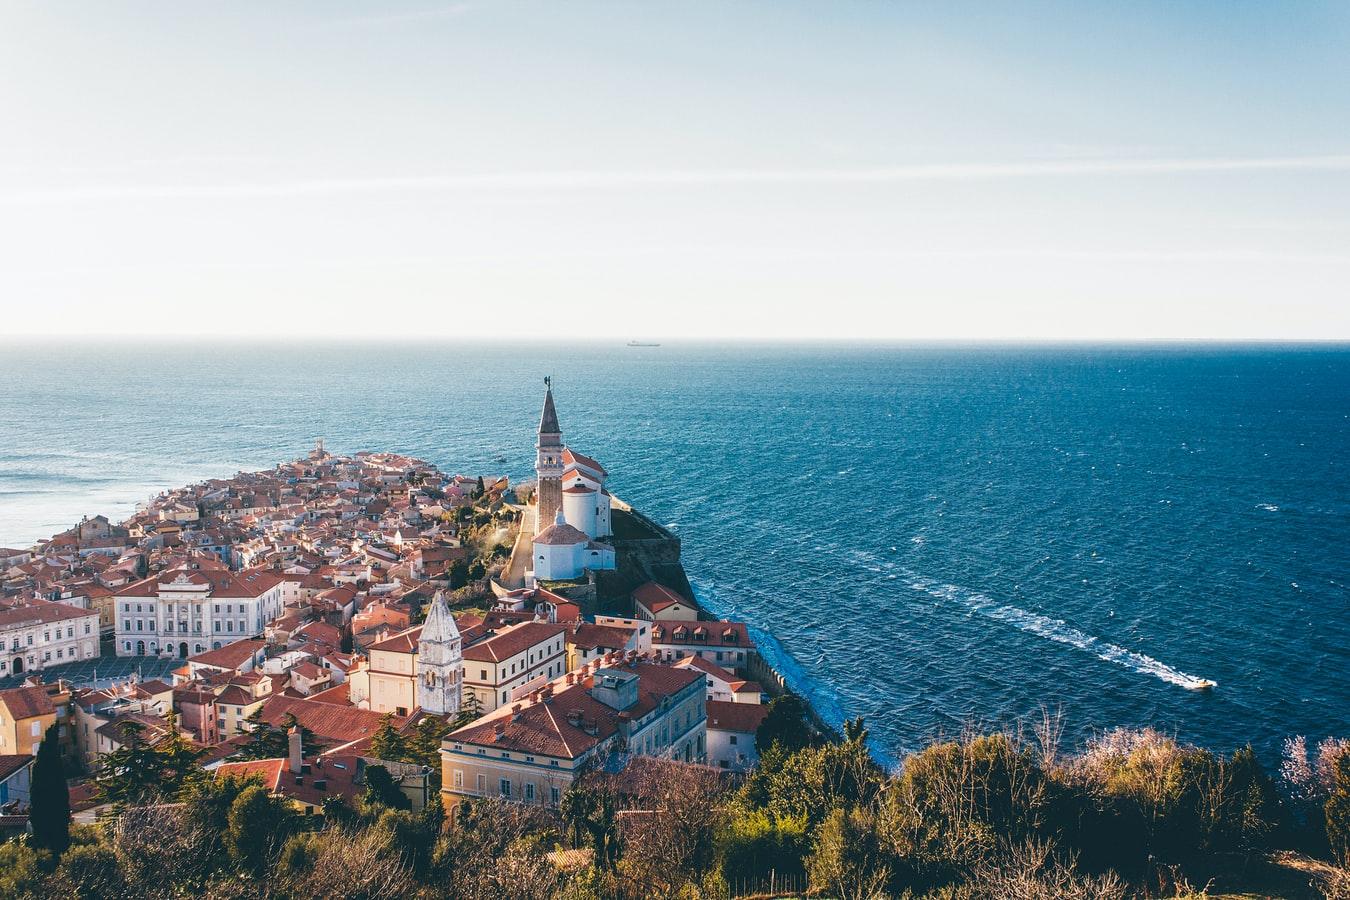 Auslandspraktikum in Slowenien - Piran